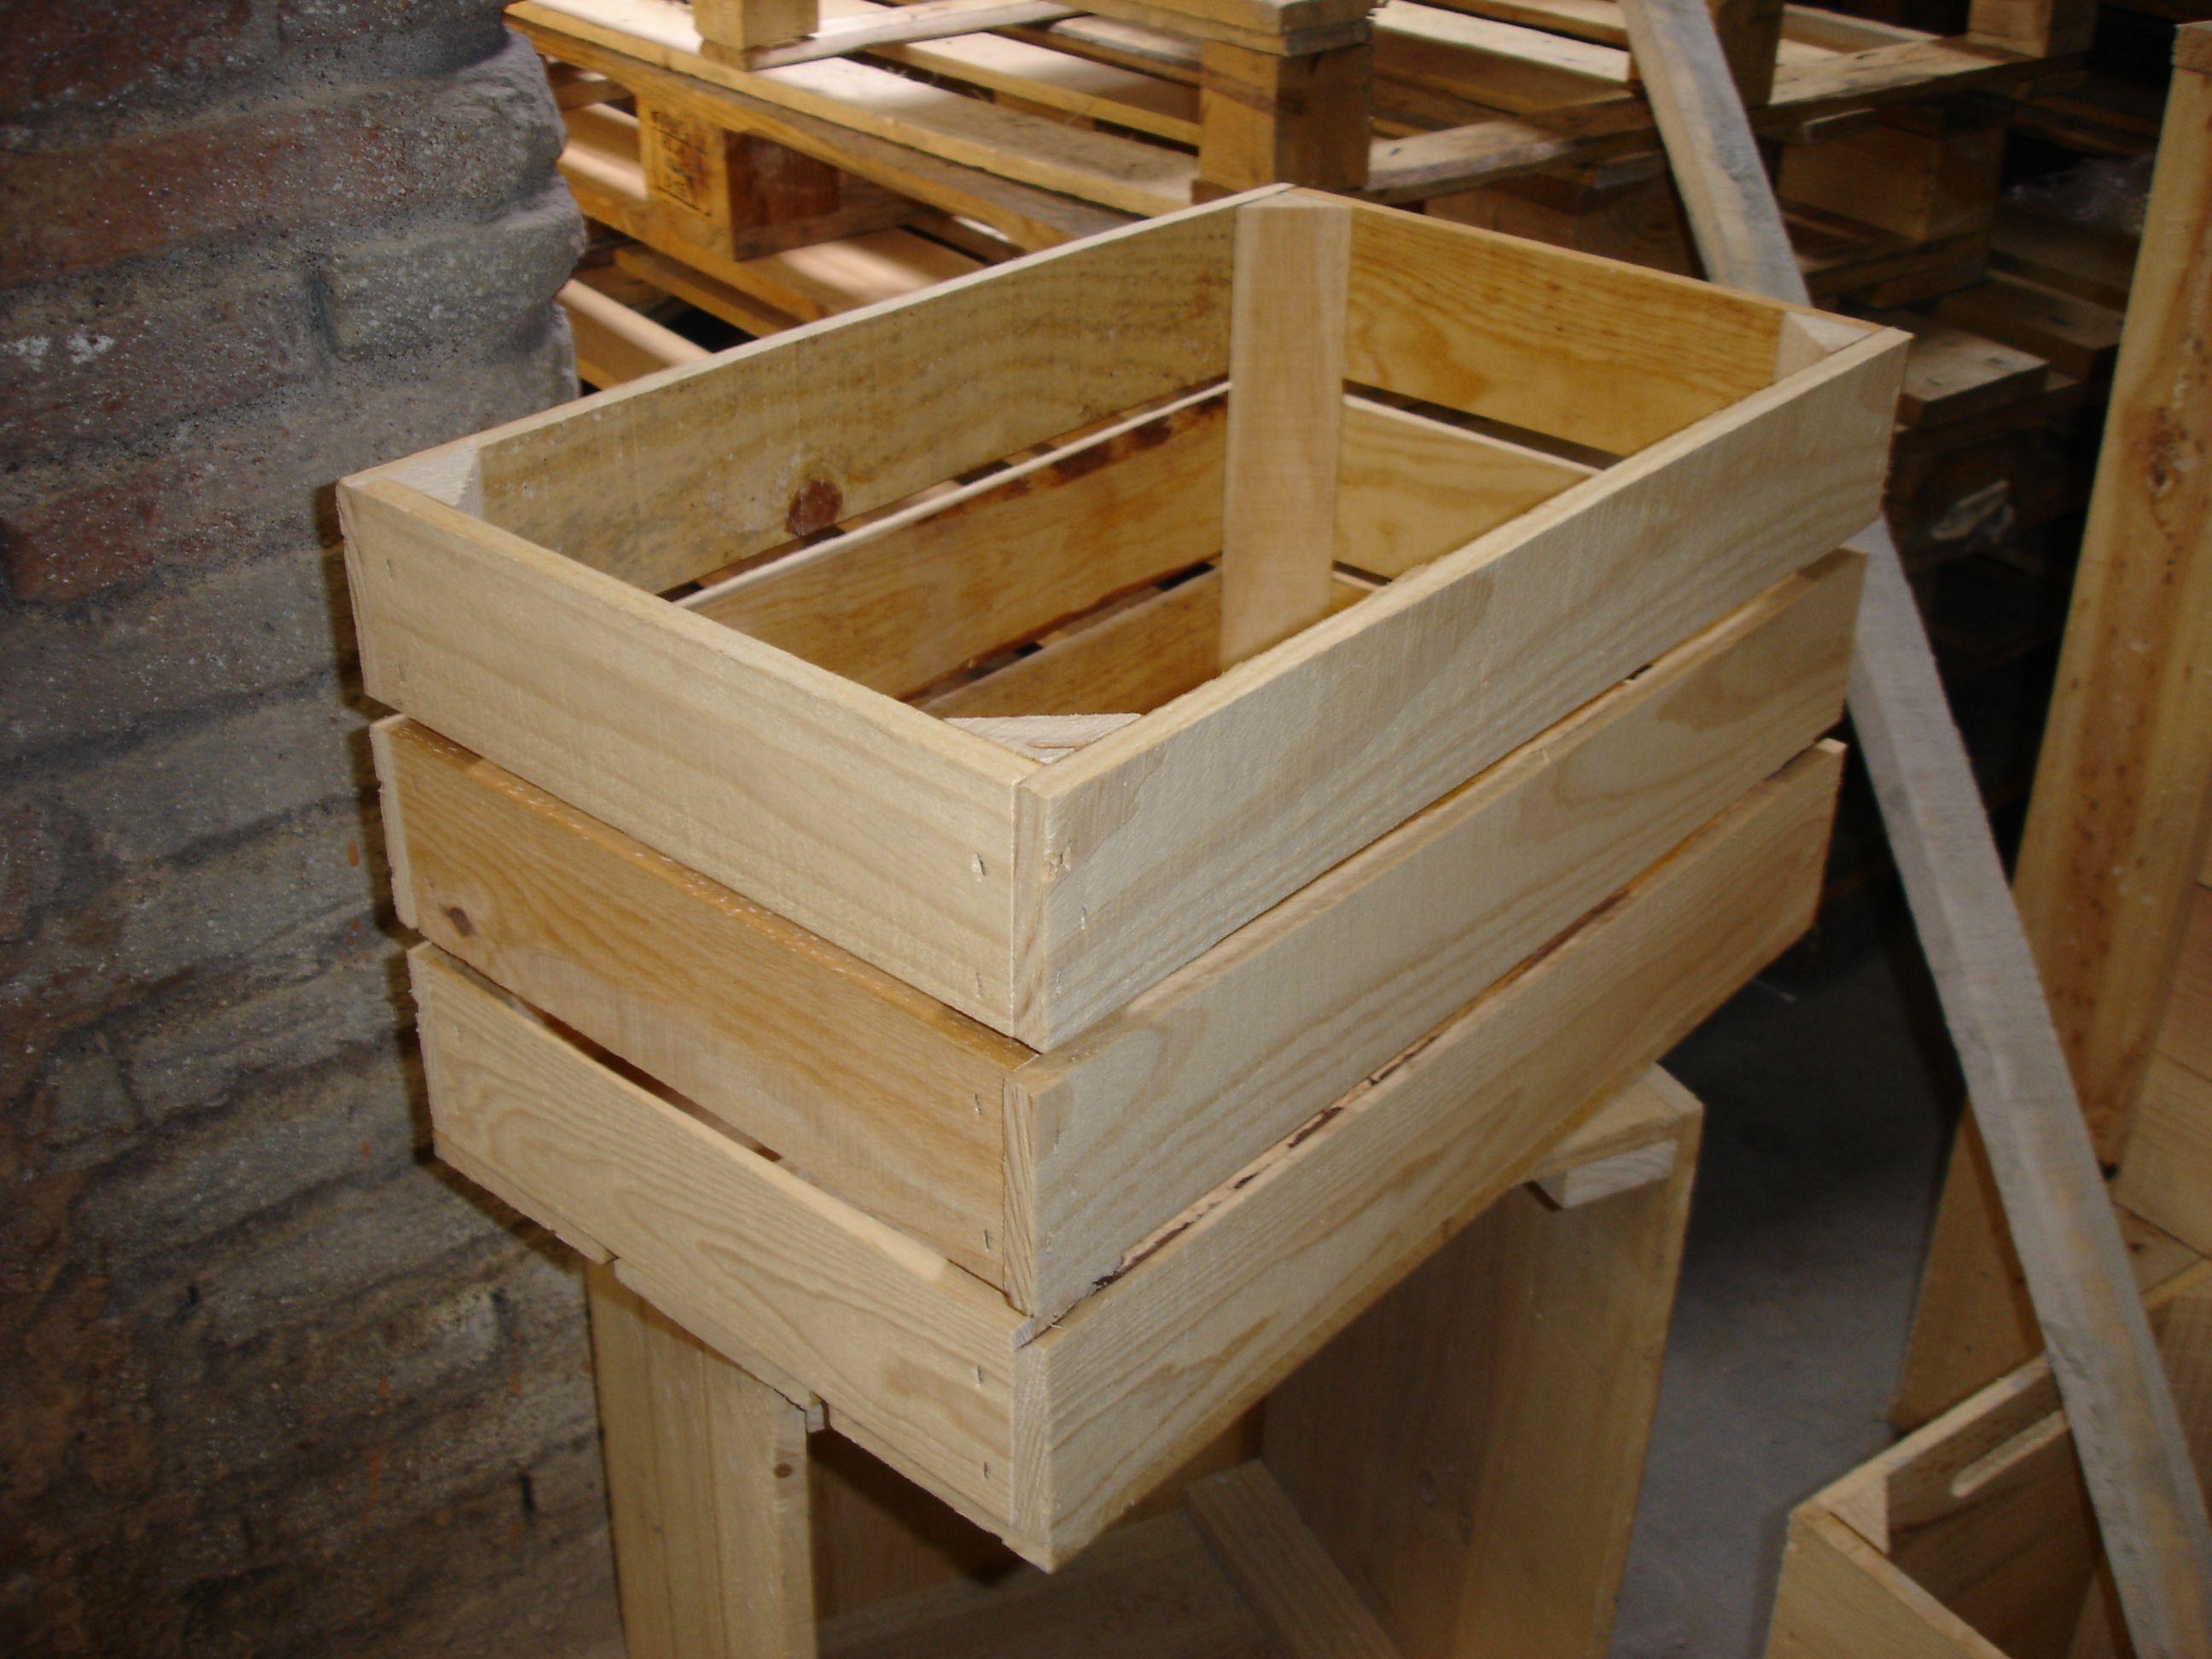 Caja madera fruta modelo 4F cajas madera fruta decoracin